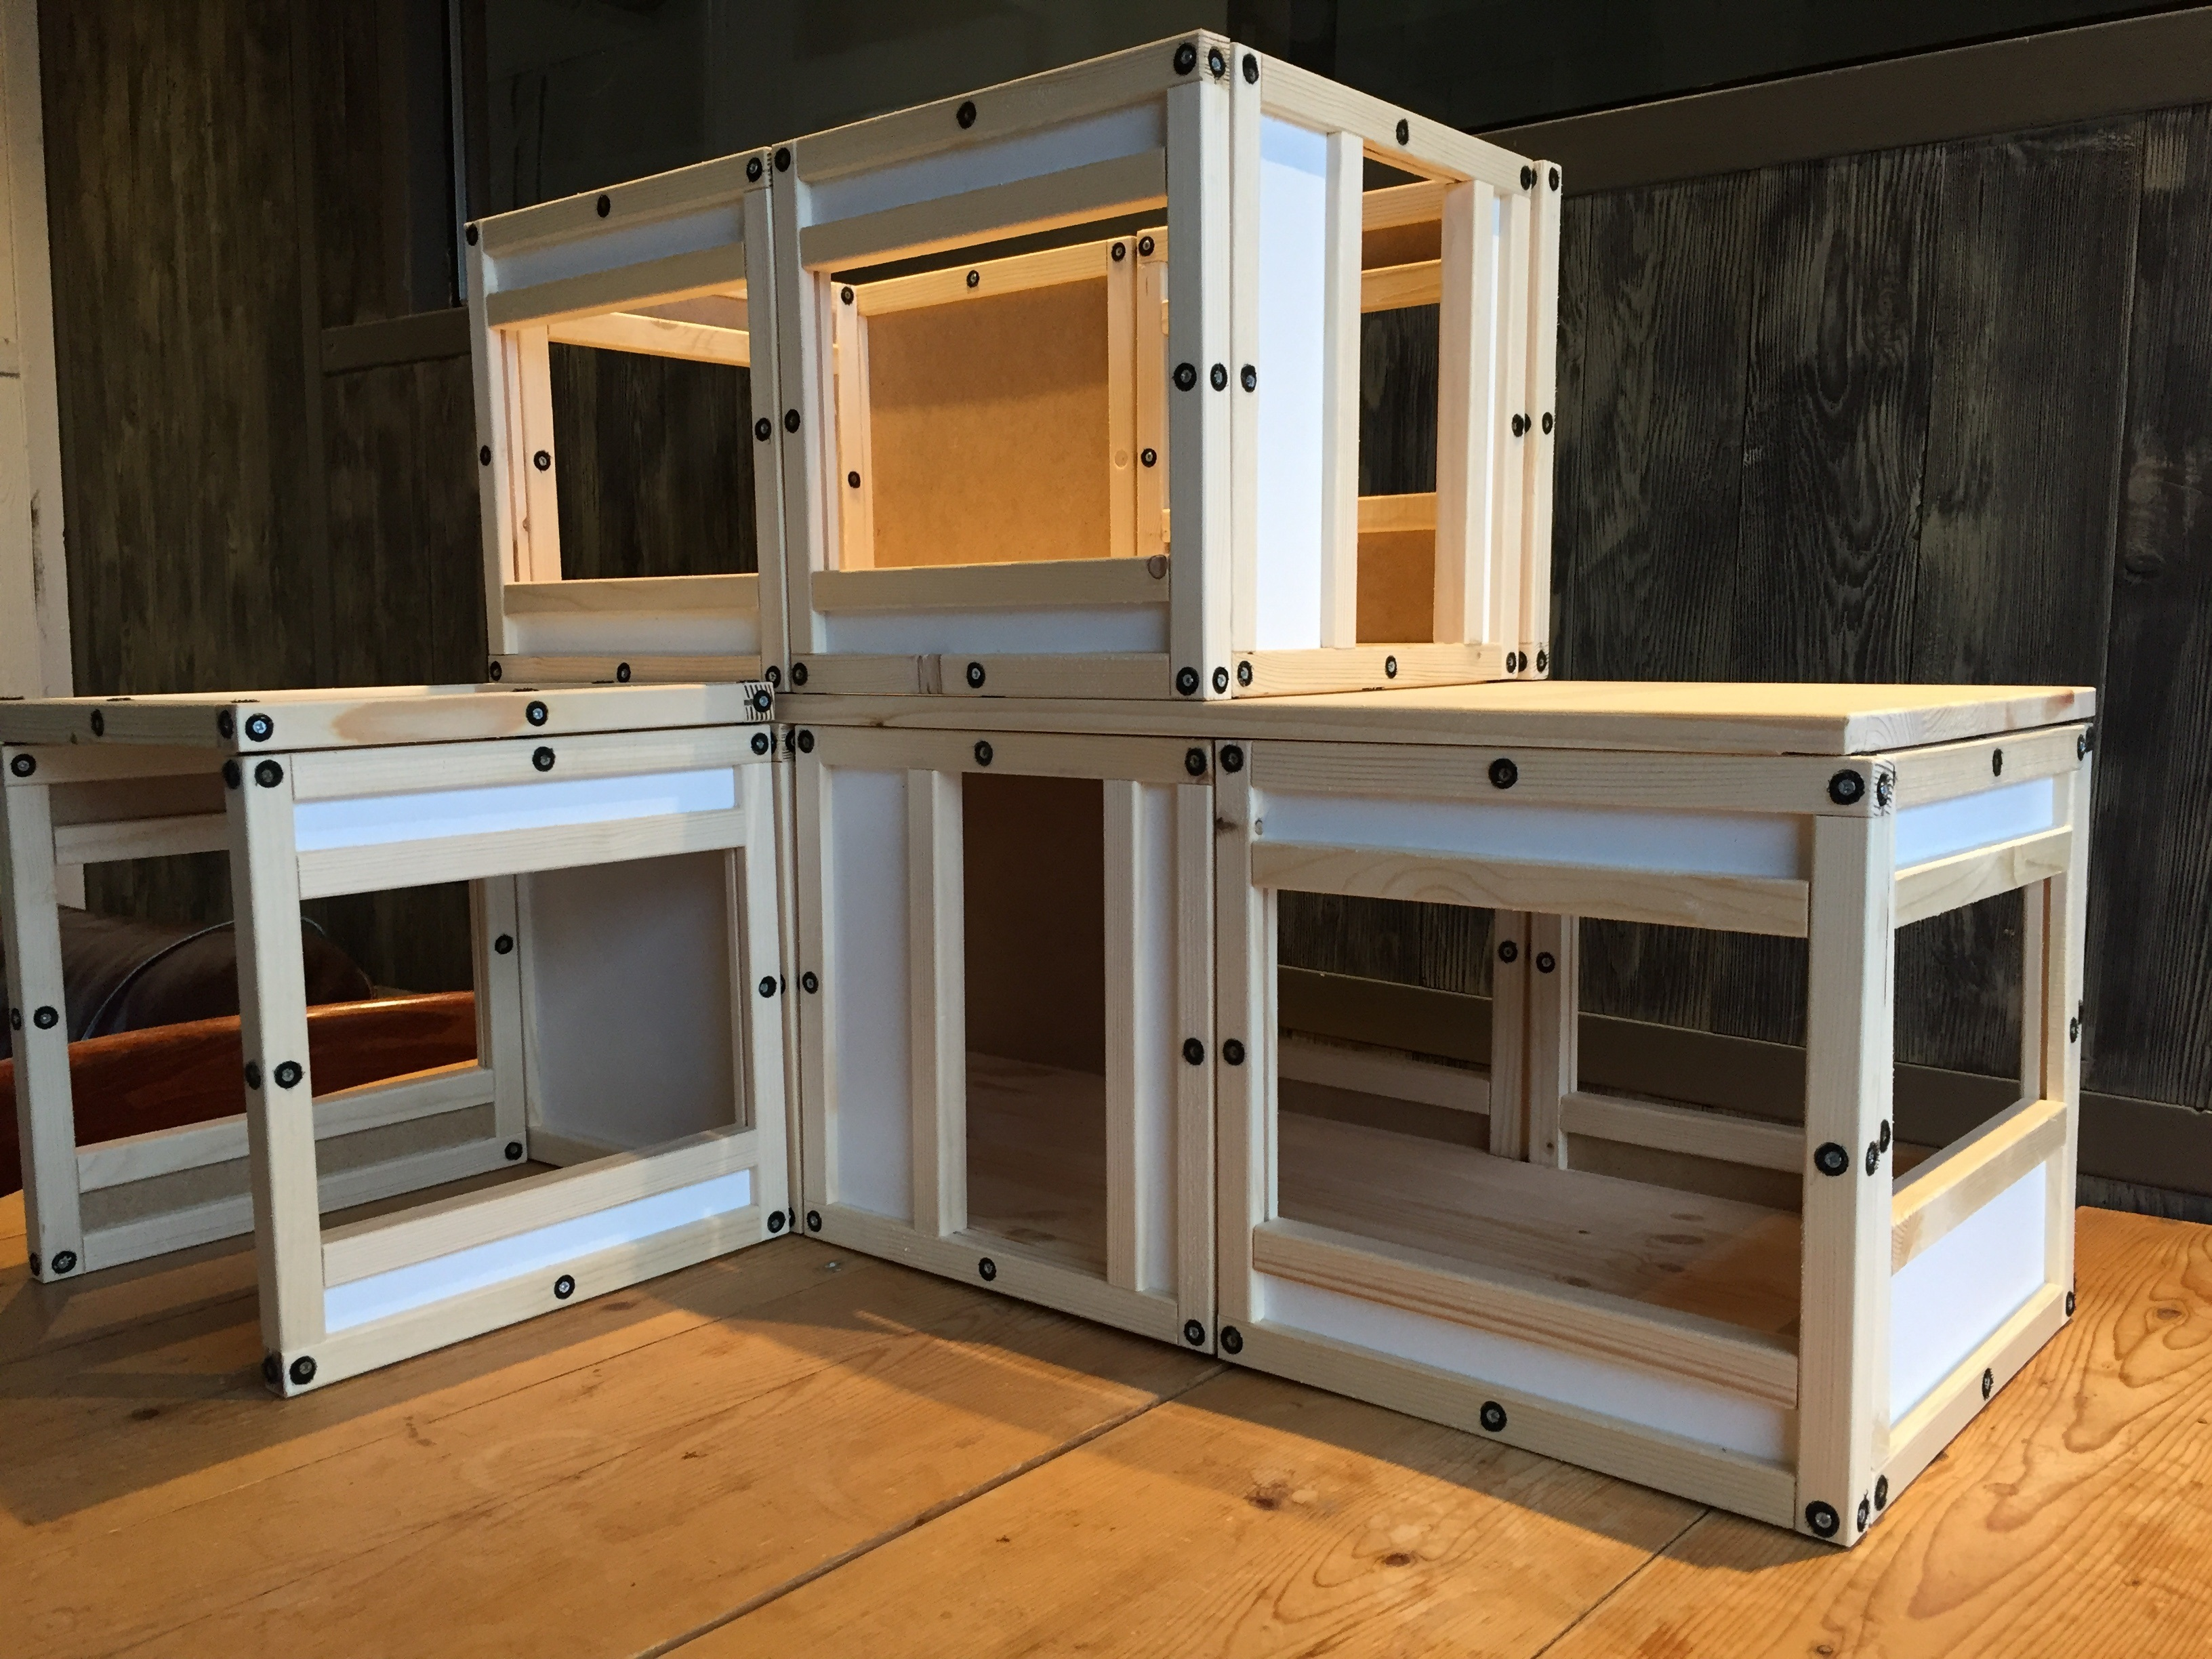 Je eigen poppen huis maken for Poppenhuis bouwen